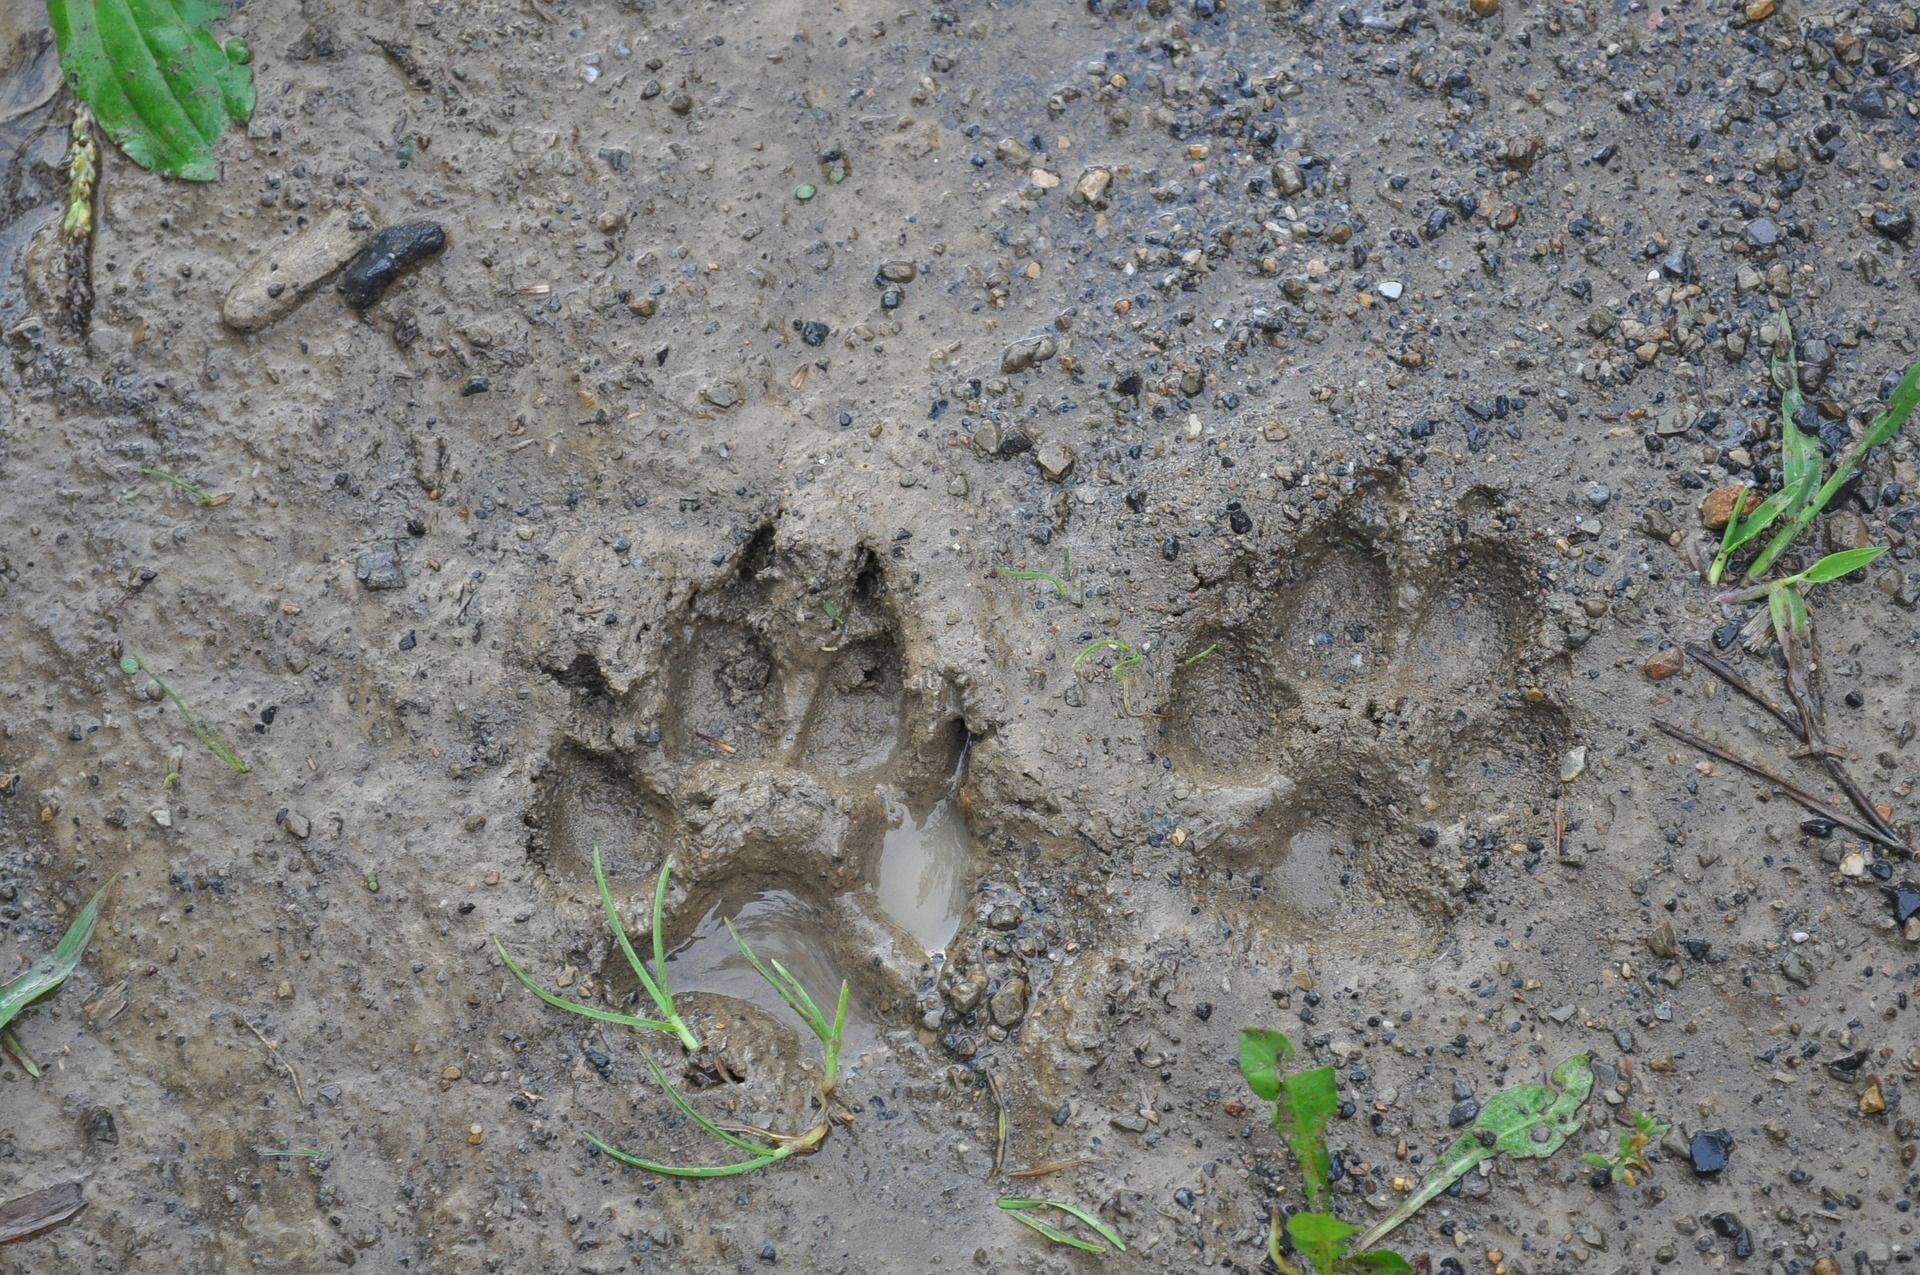 Animal Track Identification